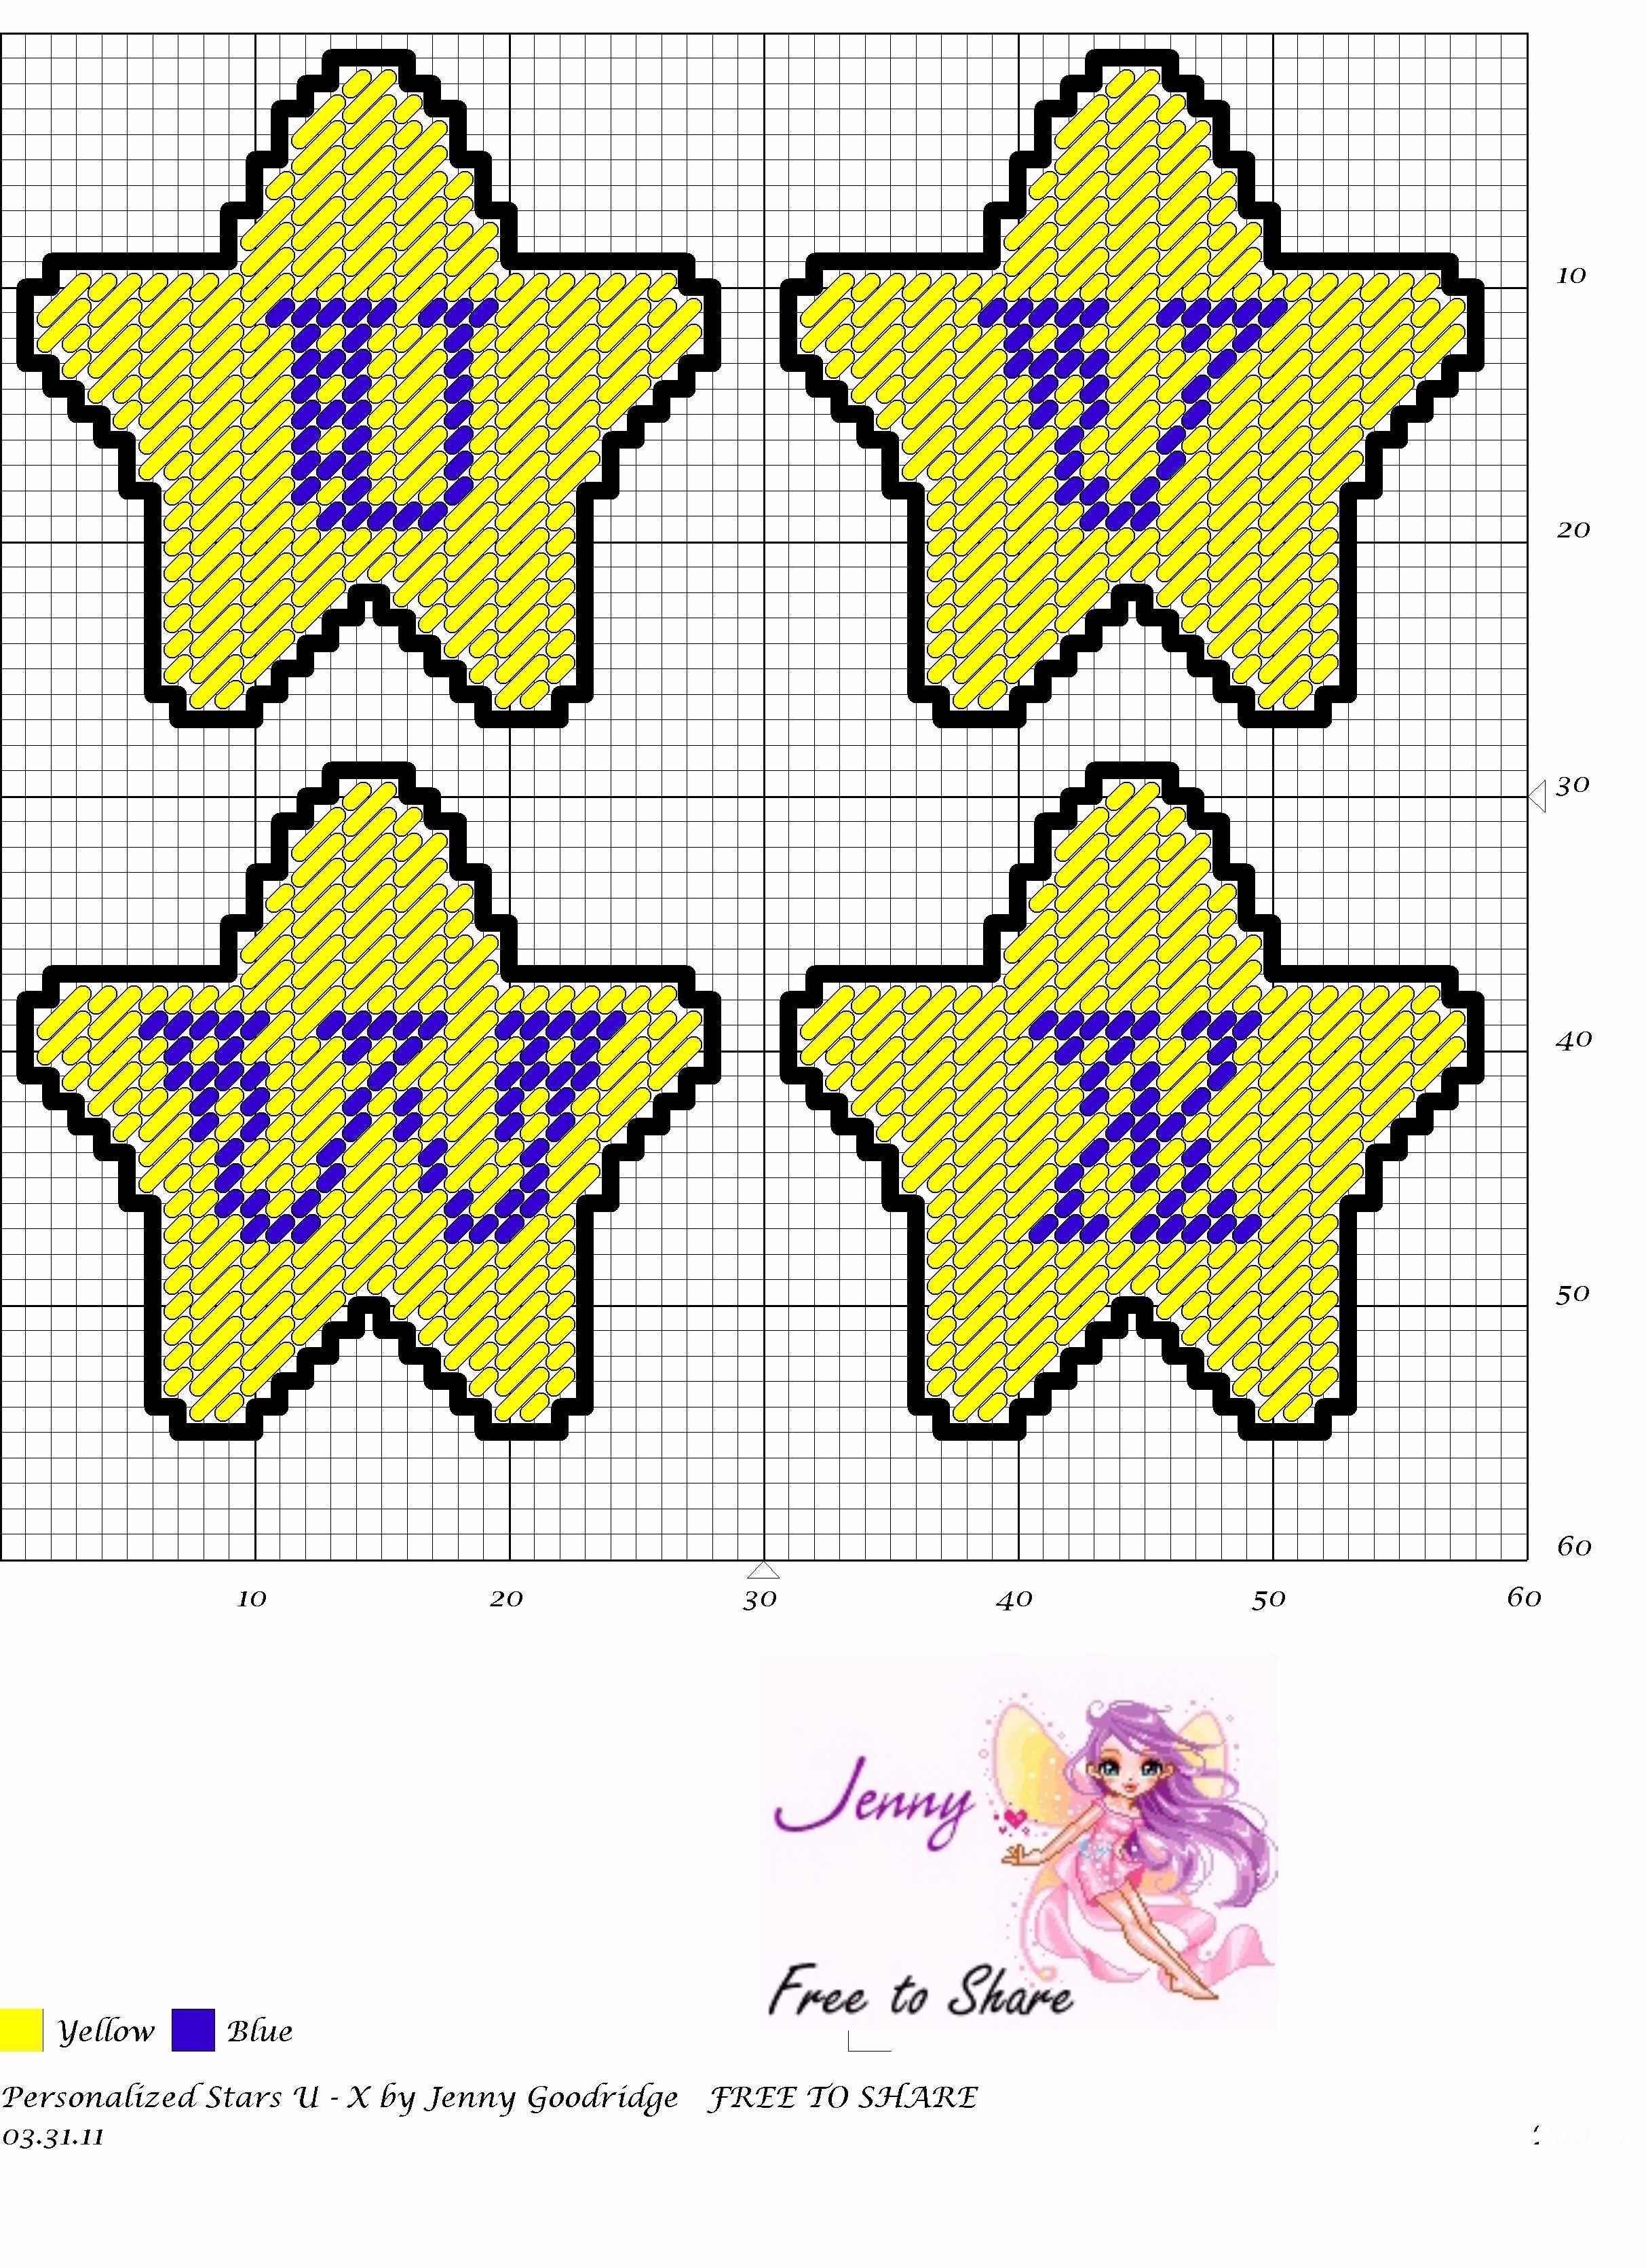 Personalized Stars U-X | alfabeto punto de cruz | Pinterest ...